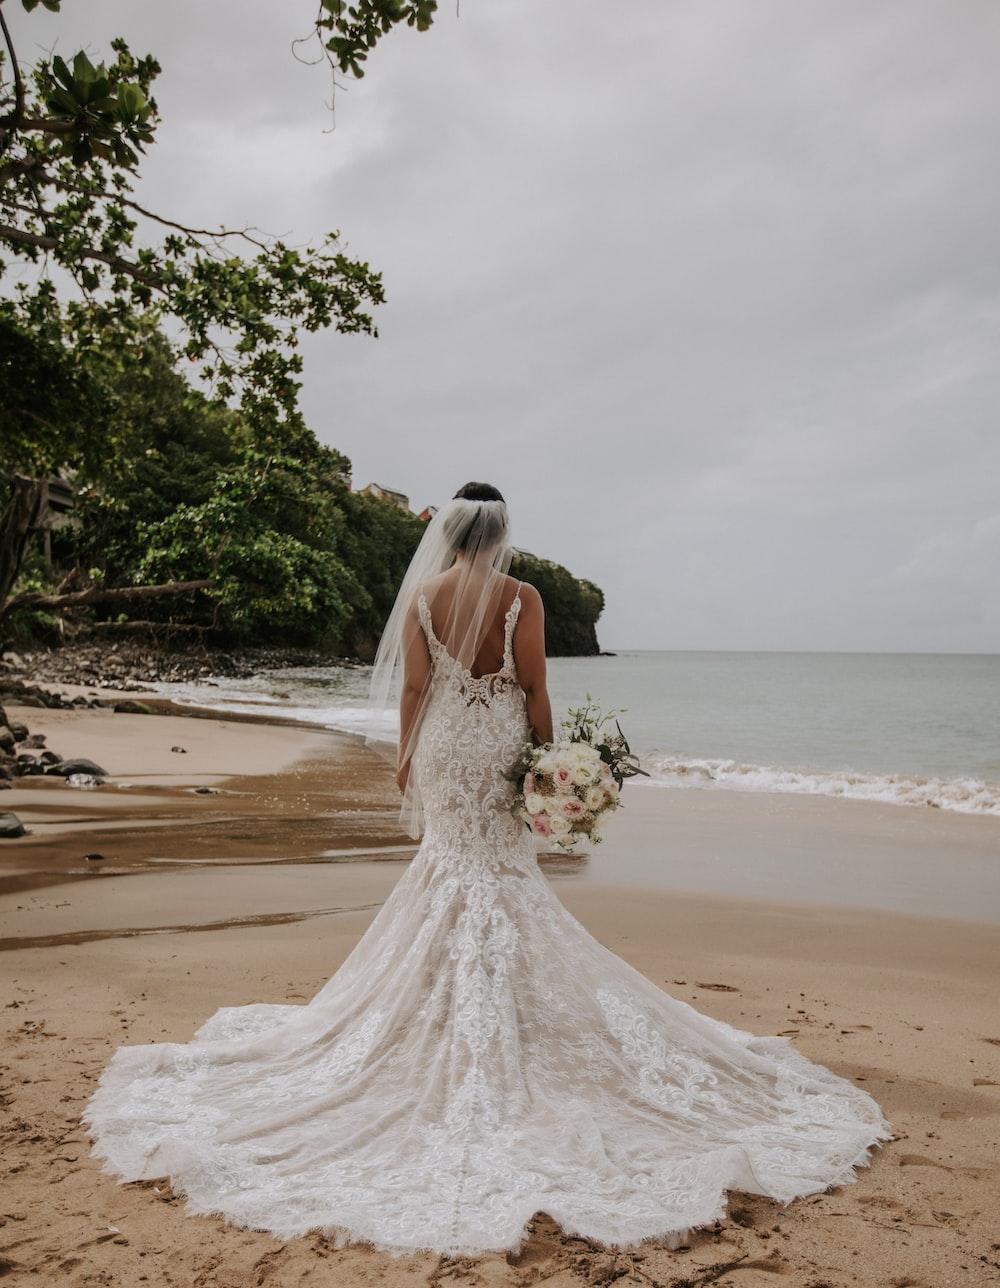 woman wearing wedding dress standing near shore